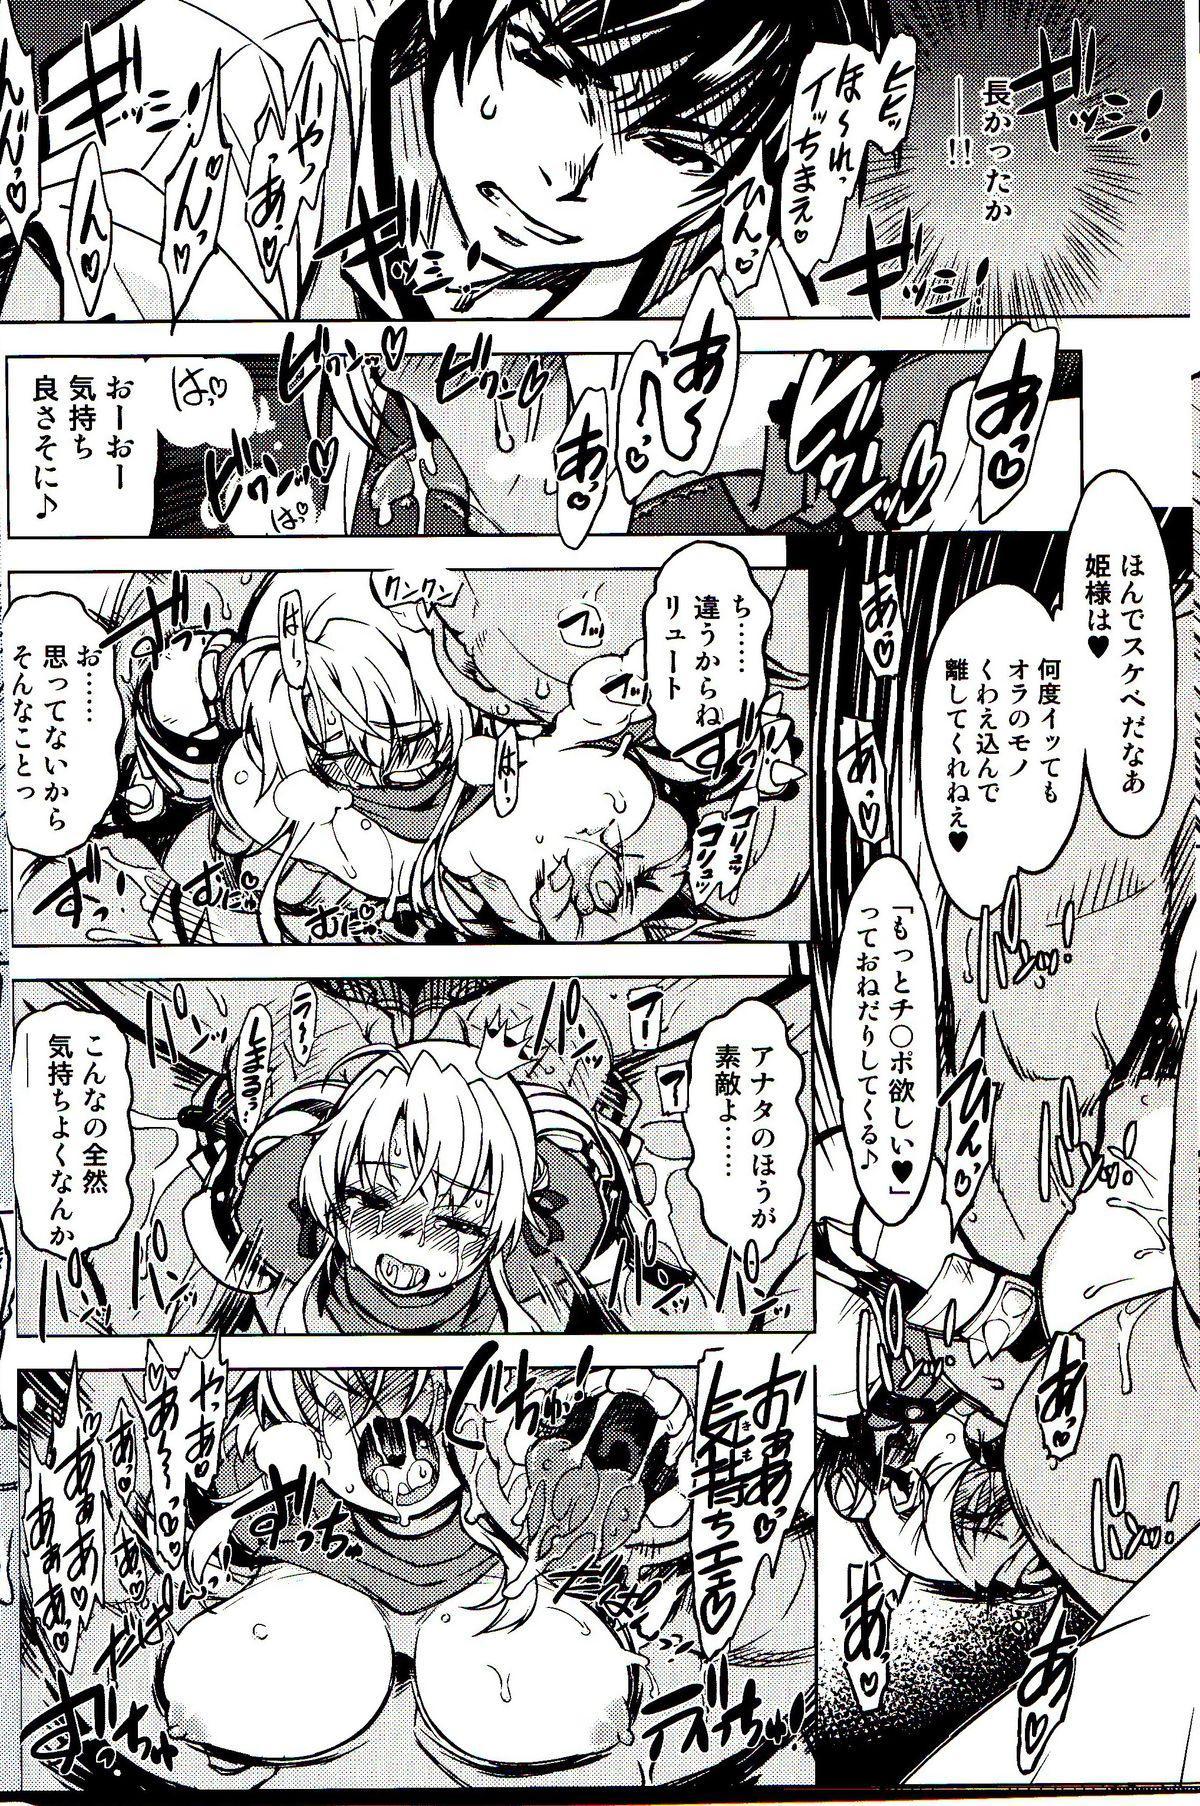 Hime Kishi Tame 3 17